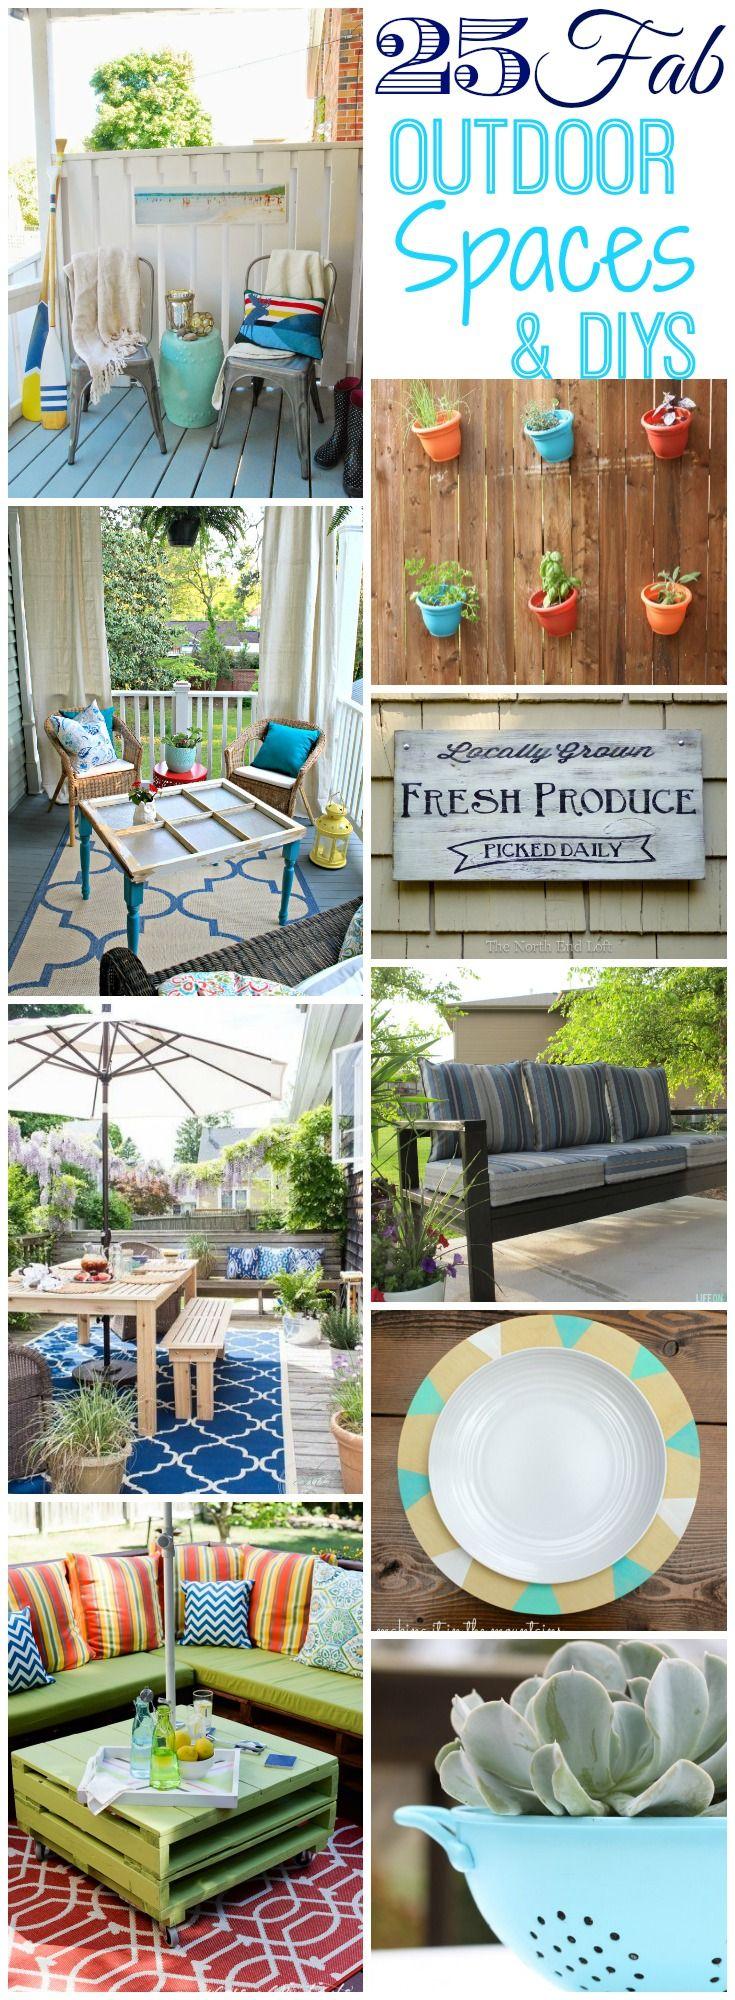 465 best yard images on pinterest backyard ideas patio ideas